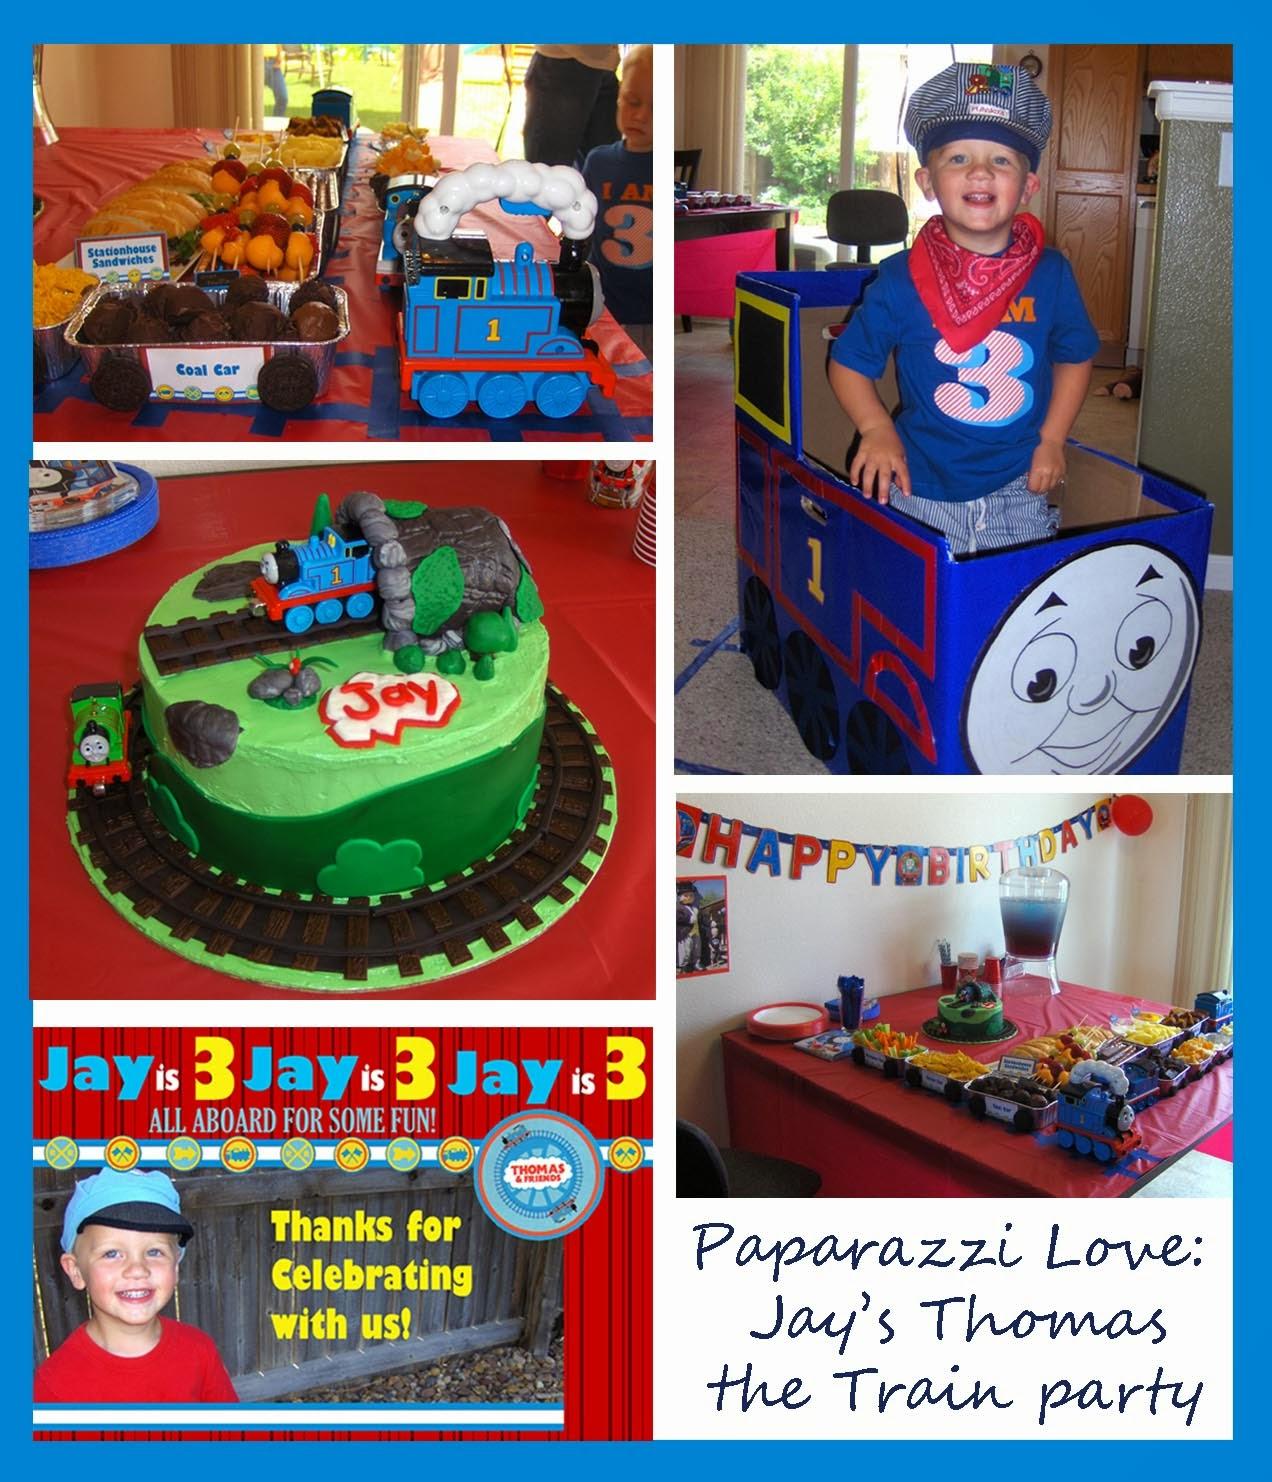 paparazzi love jay 39 s thomas the train birthday party. Black Bedroom Furniture Sets. Home Design Ideas